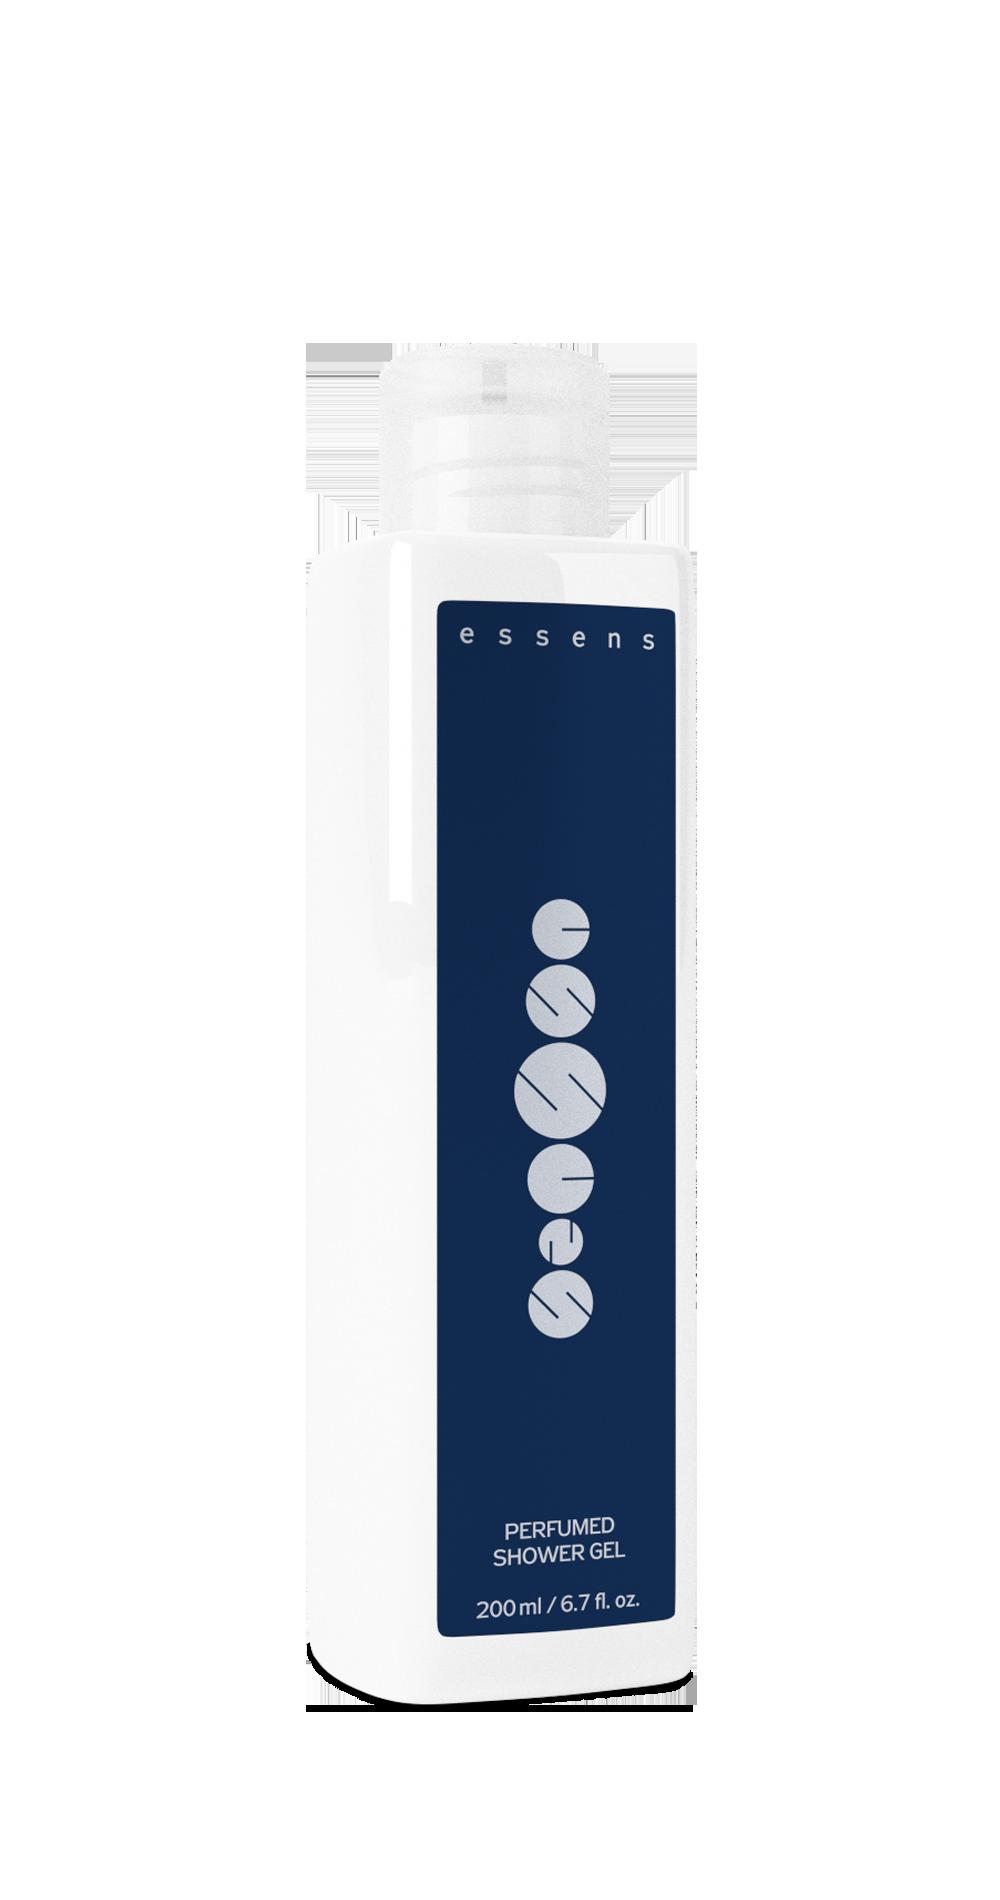 ESSENS m001 Objem: Sprchový gel 200ml